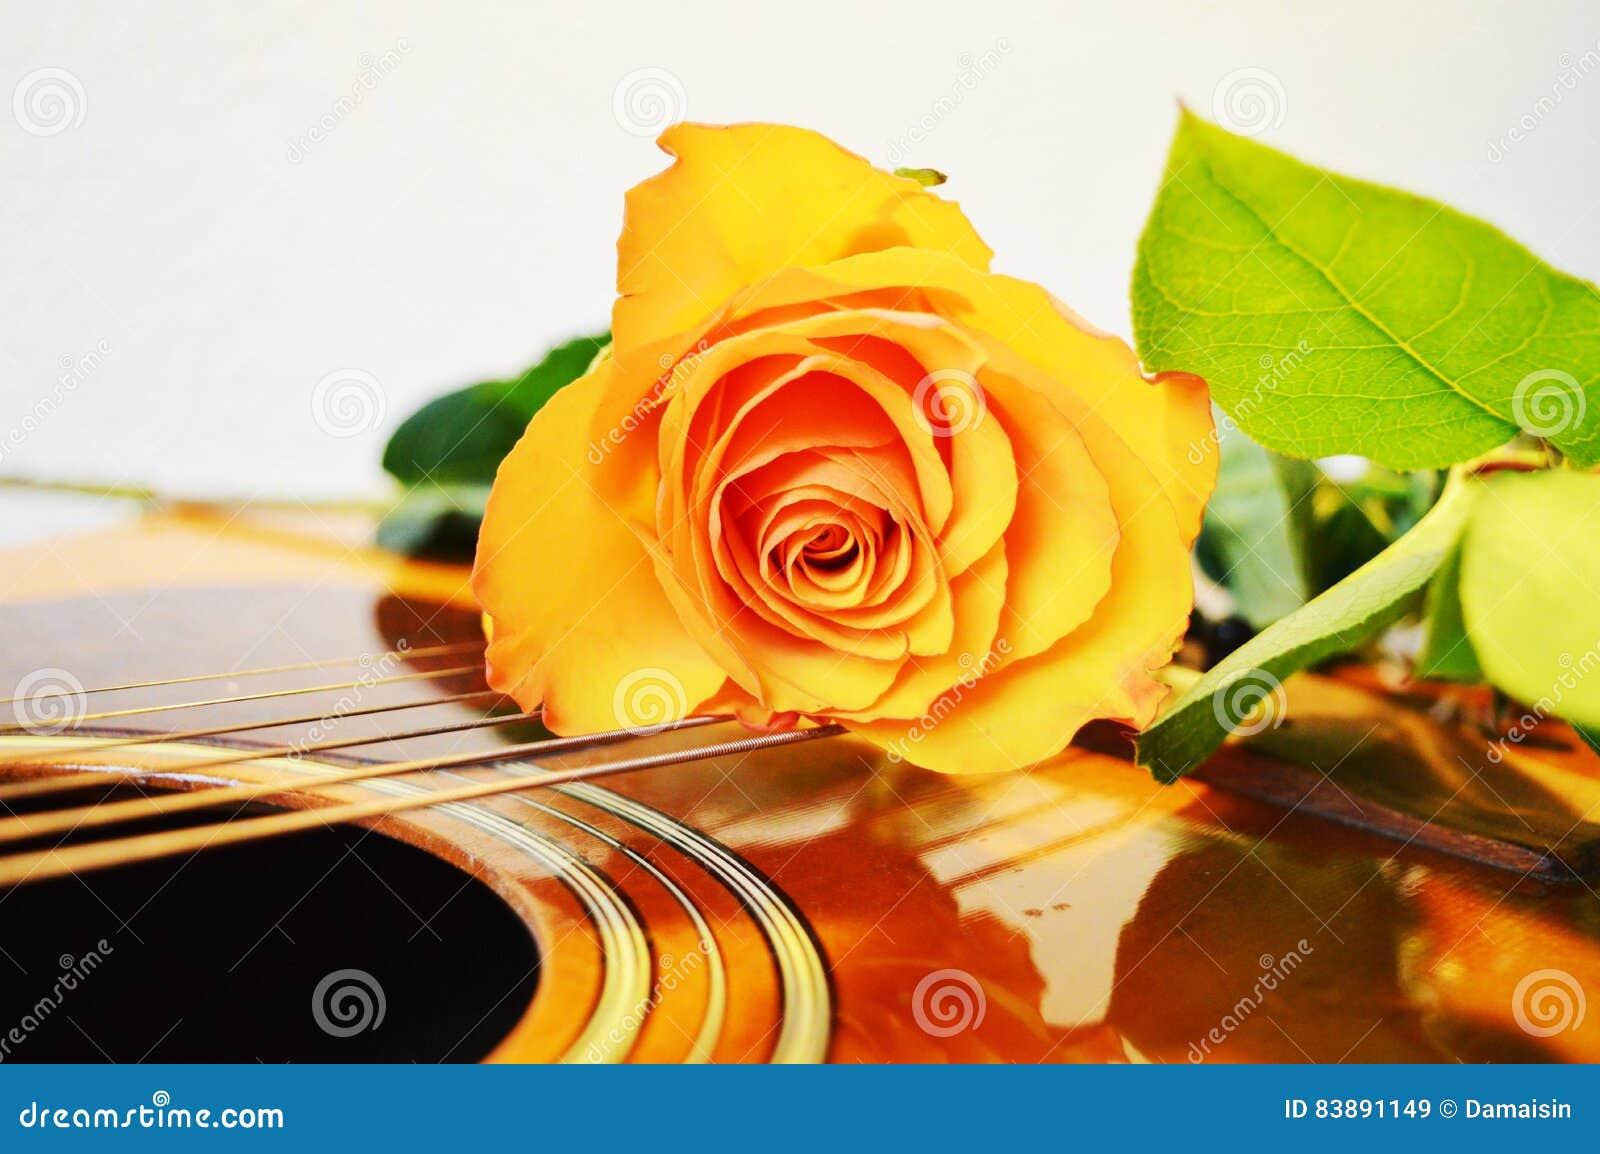 Music And Love Symbols Stock Image Image Of Symbols 83891149